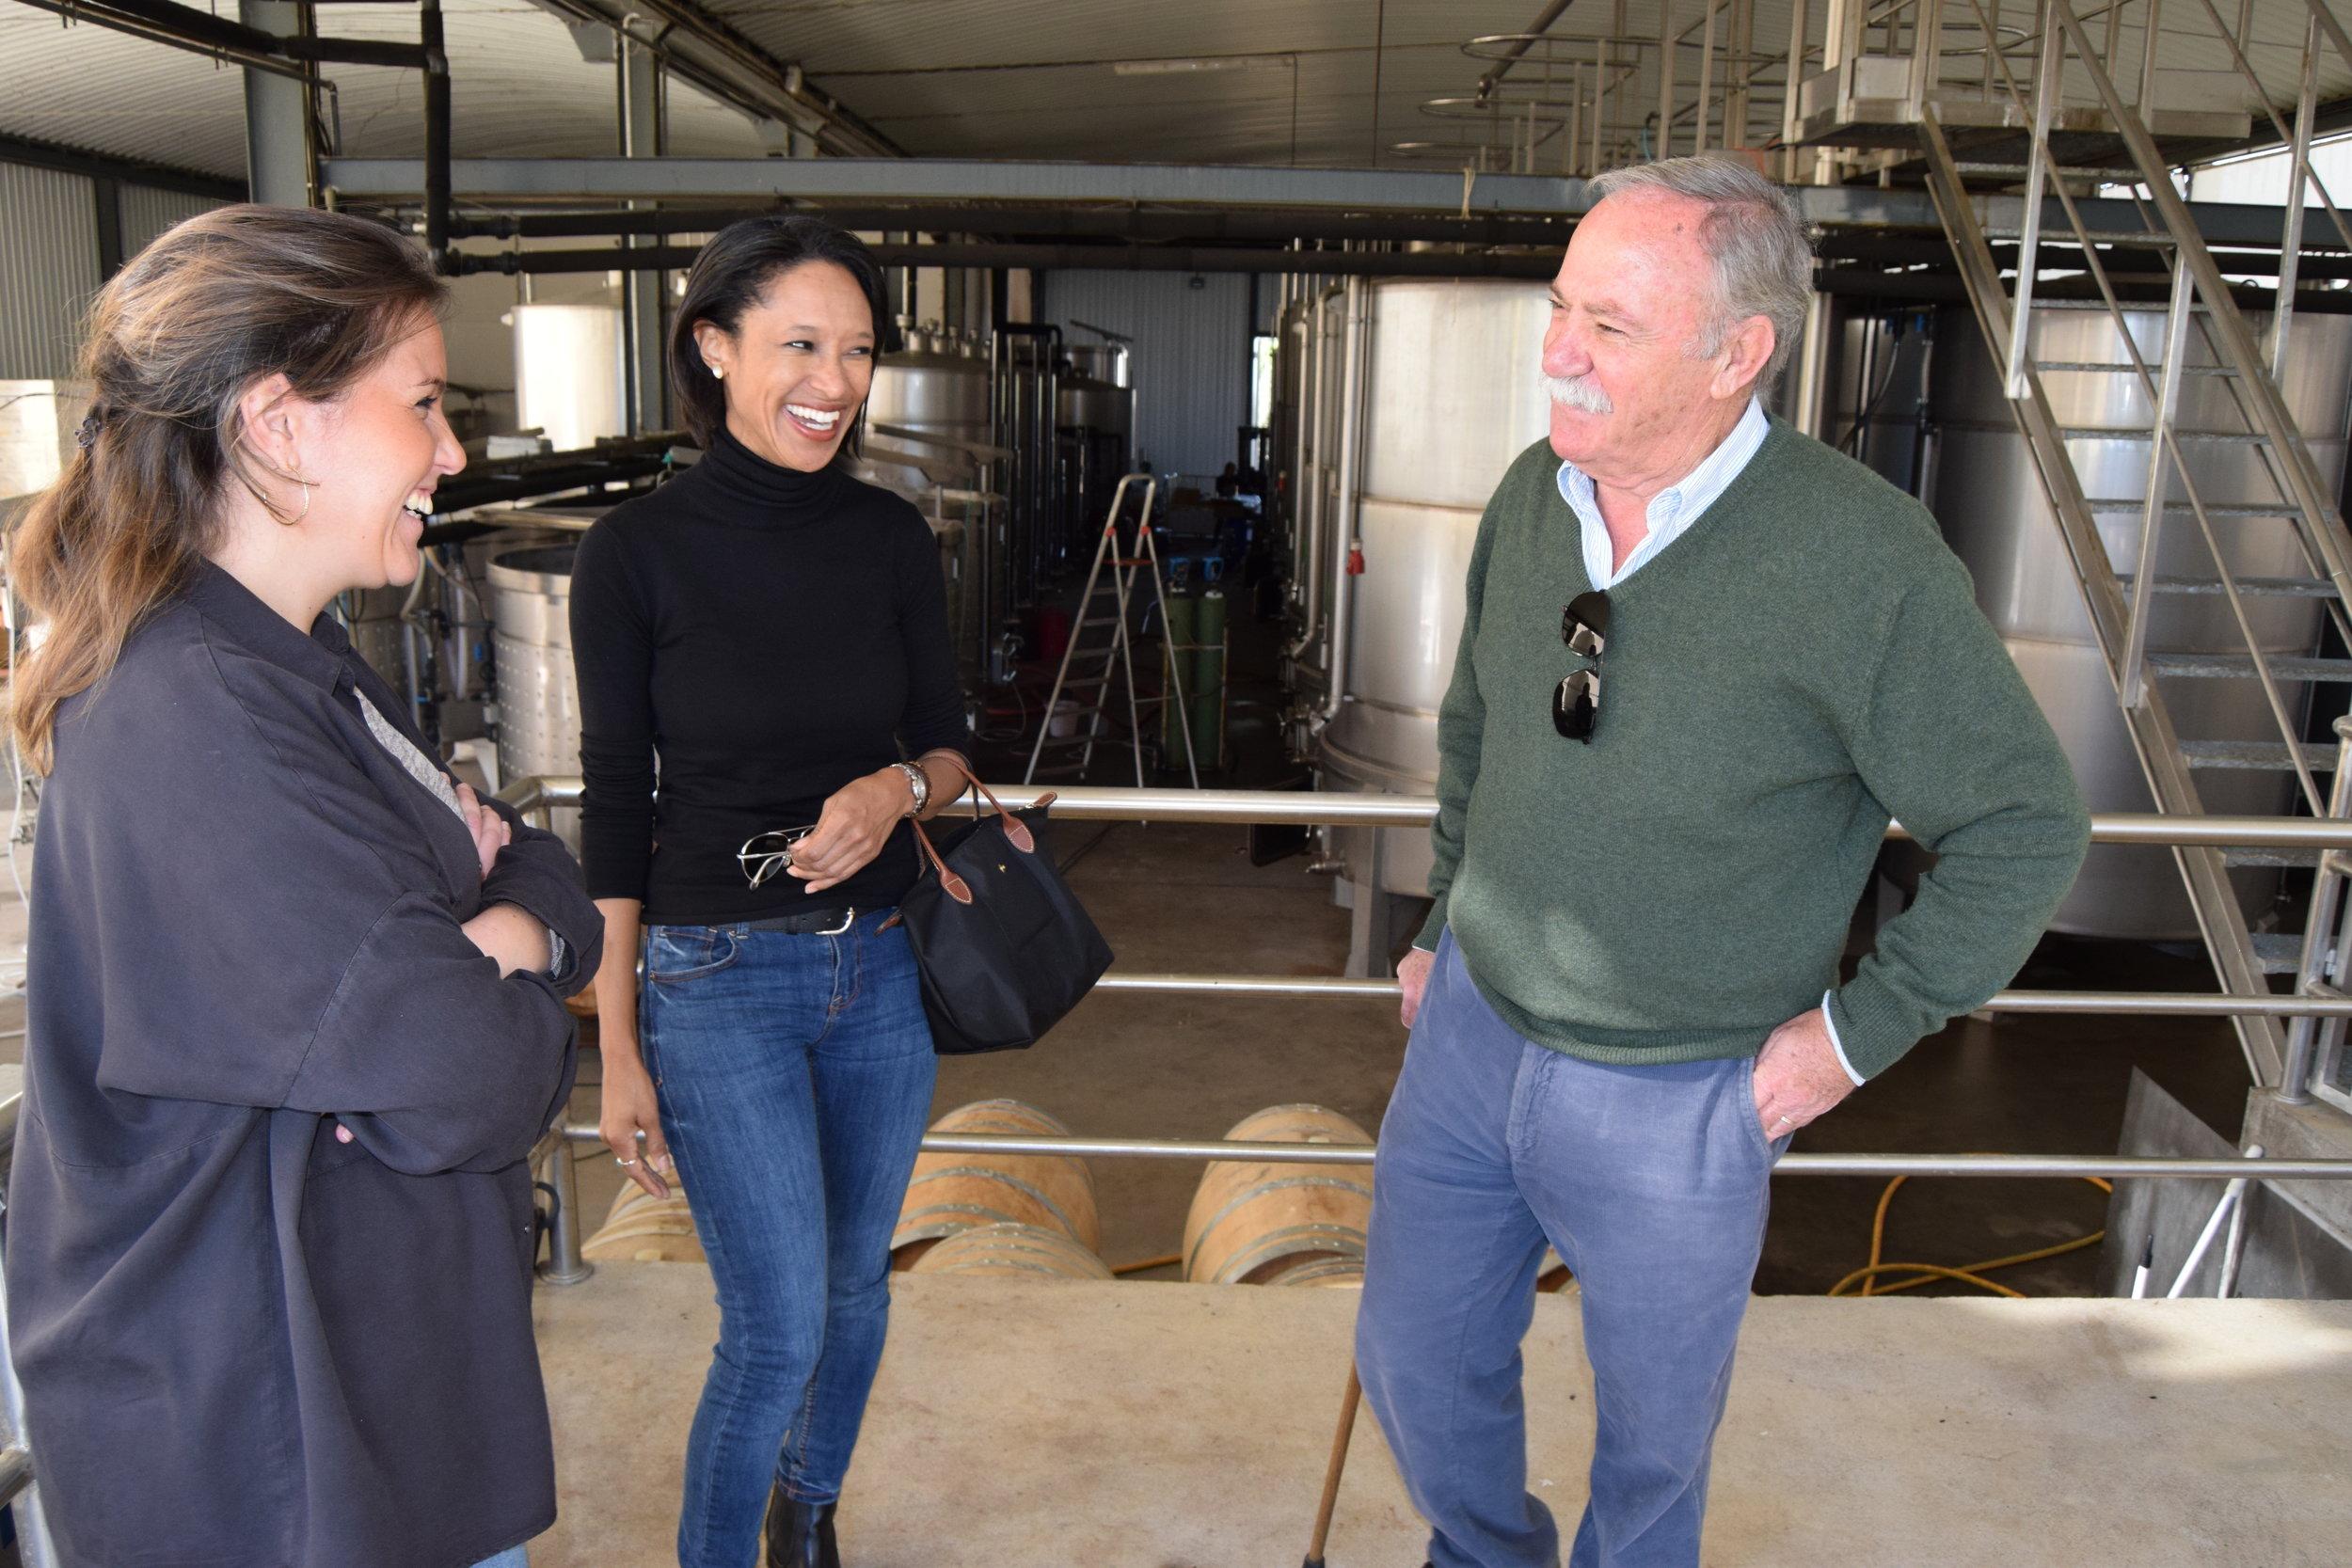 winemakers mariana lança & father, antonio manuel lança of herdade grande